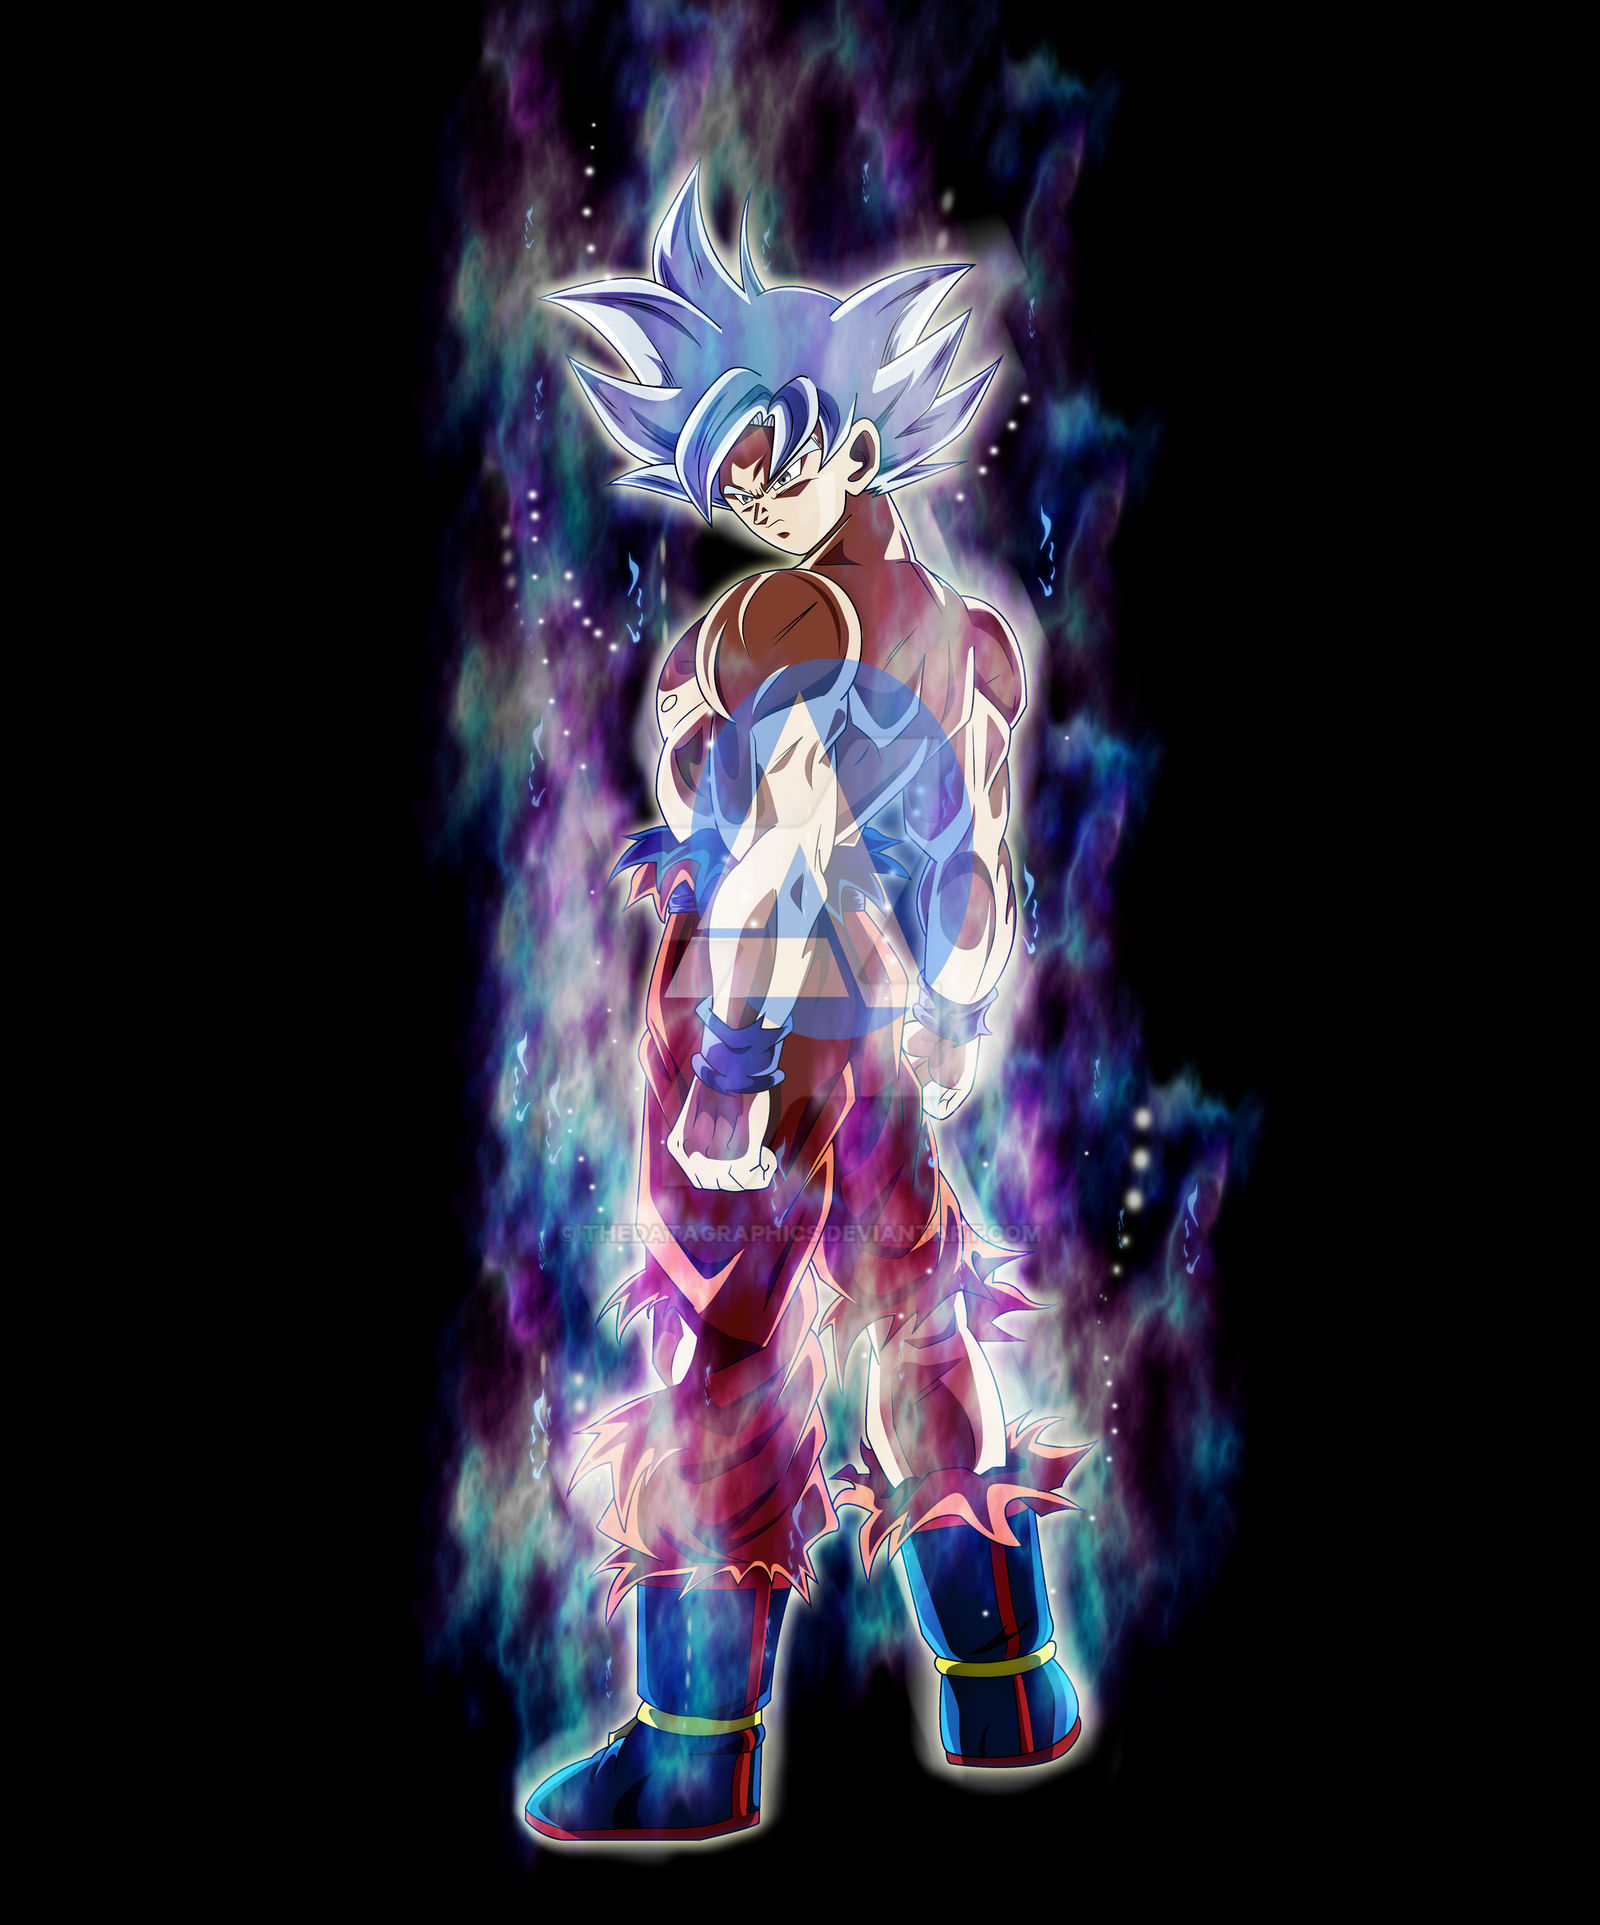 Mastered Ultra Instinct - POWER BEYOND GODS